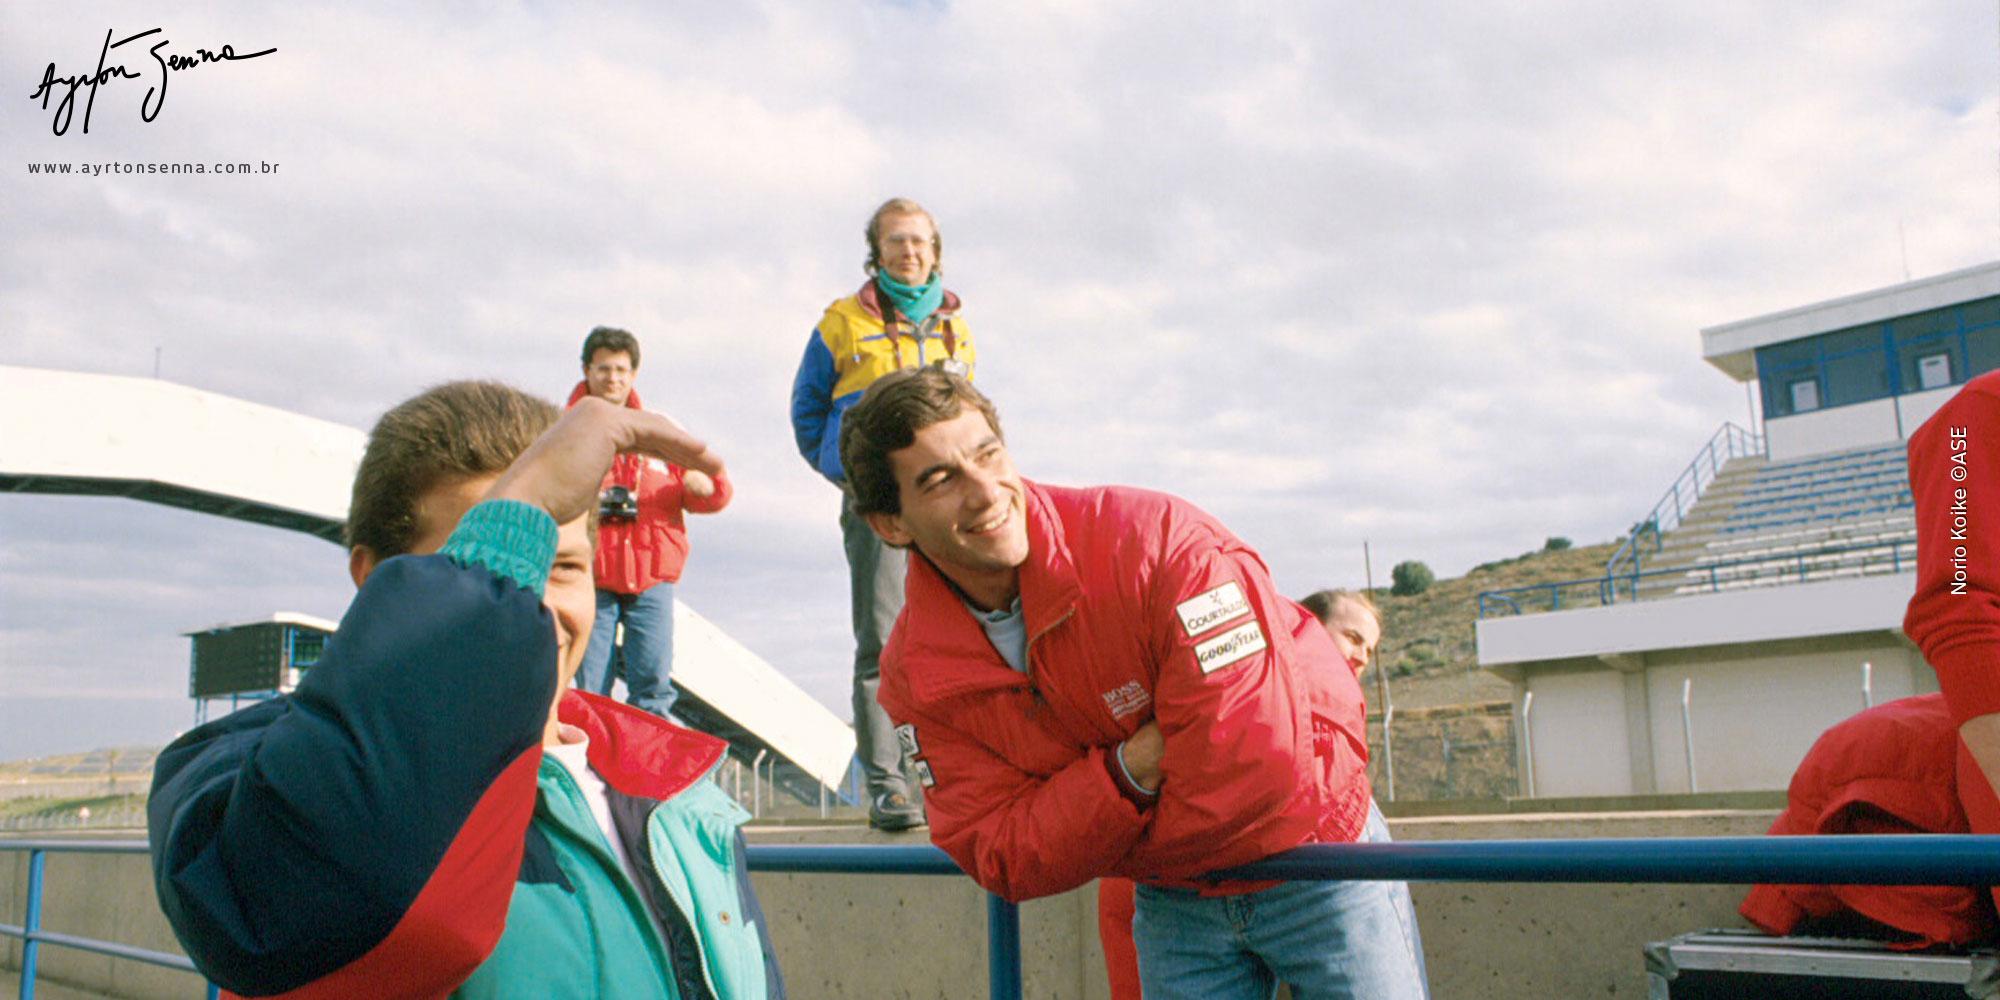 Belgian Grand Prix Circuit >> Achievements/41 Victories - The history of Ayrton Senna